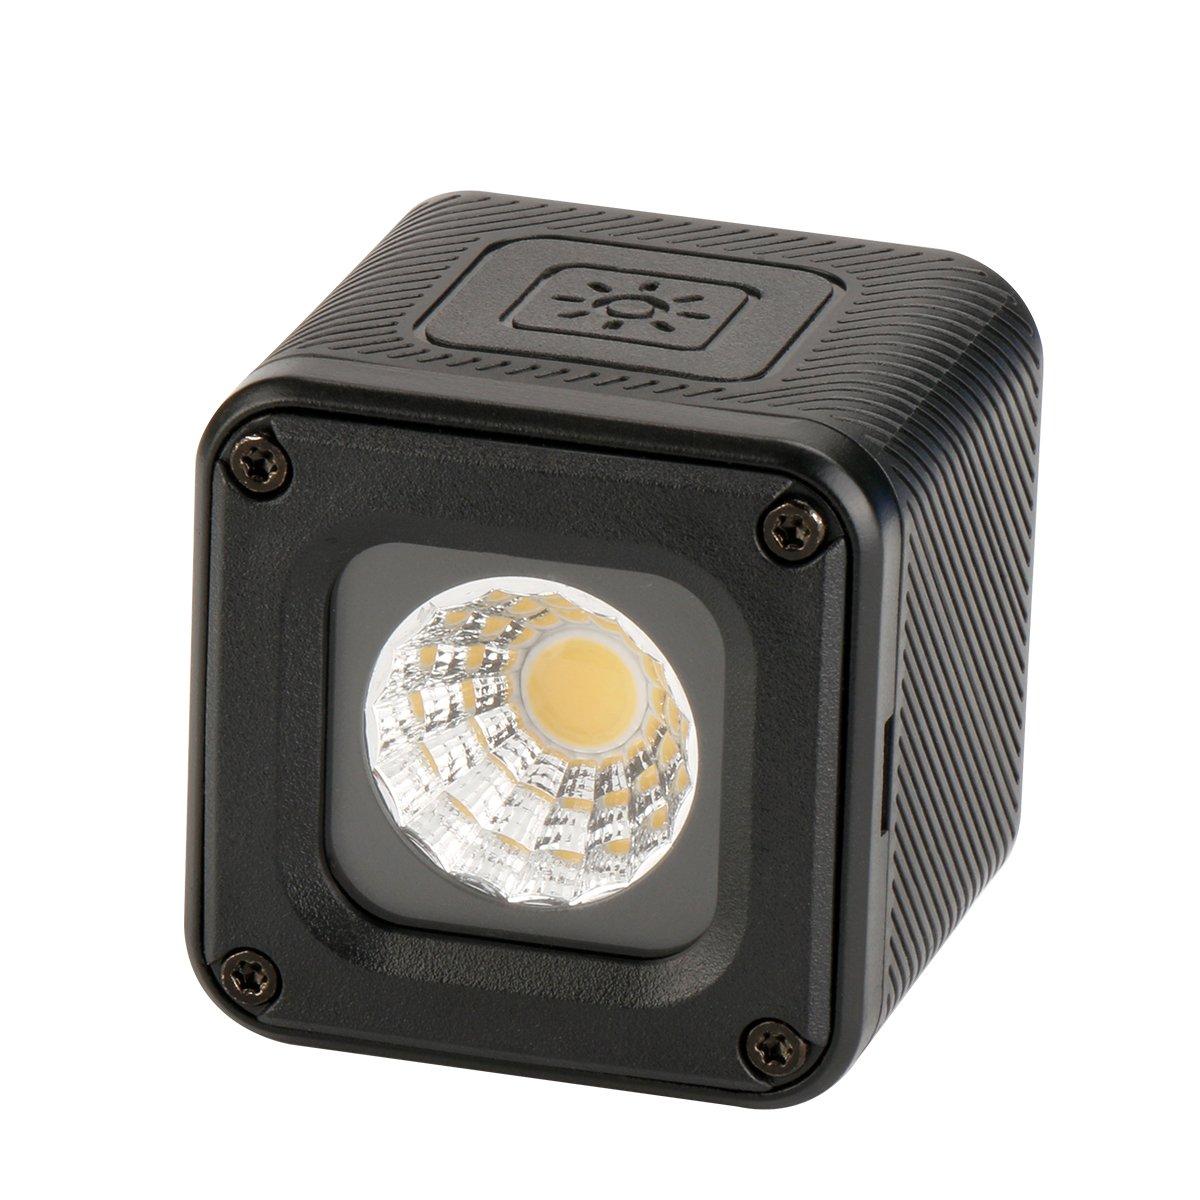 Ulanzi L1 Versatile Mini LED Light Professional Waterproof Adventure LED Lighting for Smartphone Camera Drone Photography, Video, Underwater, Bike, Camping, Drone DJI, Gopro, Canon Nikon Camera etc. by Ulanzi